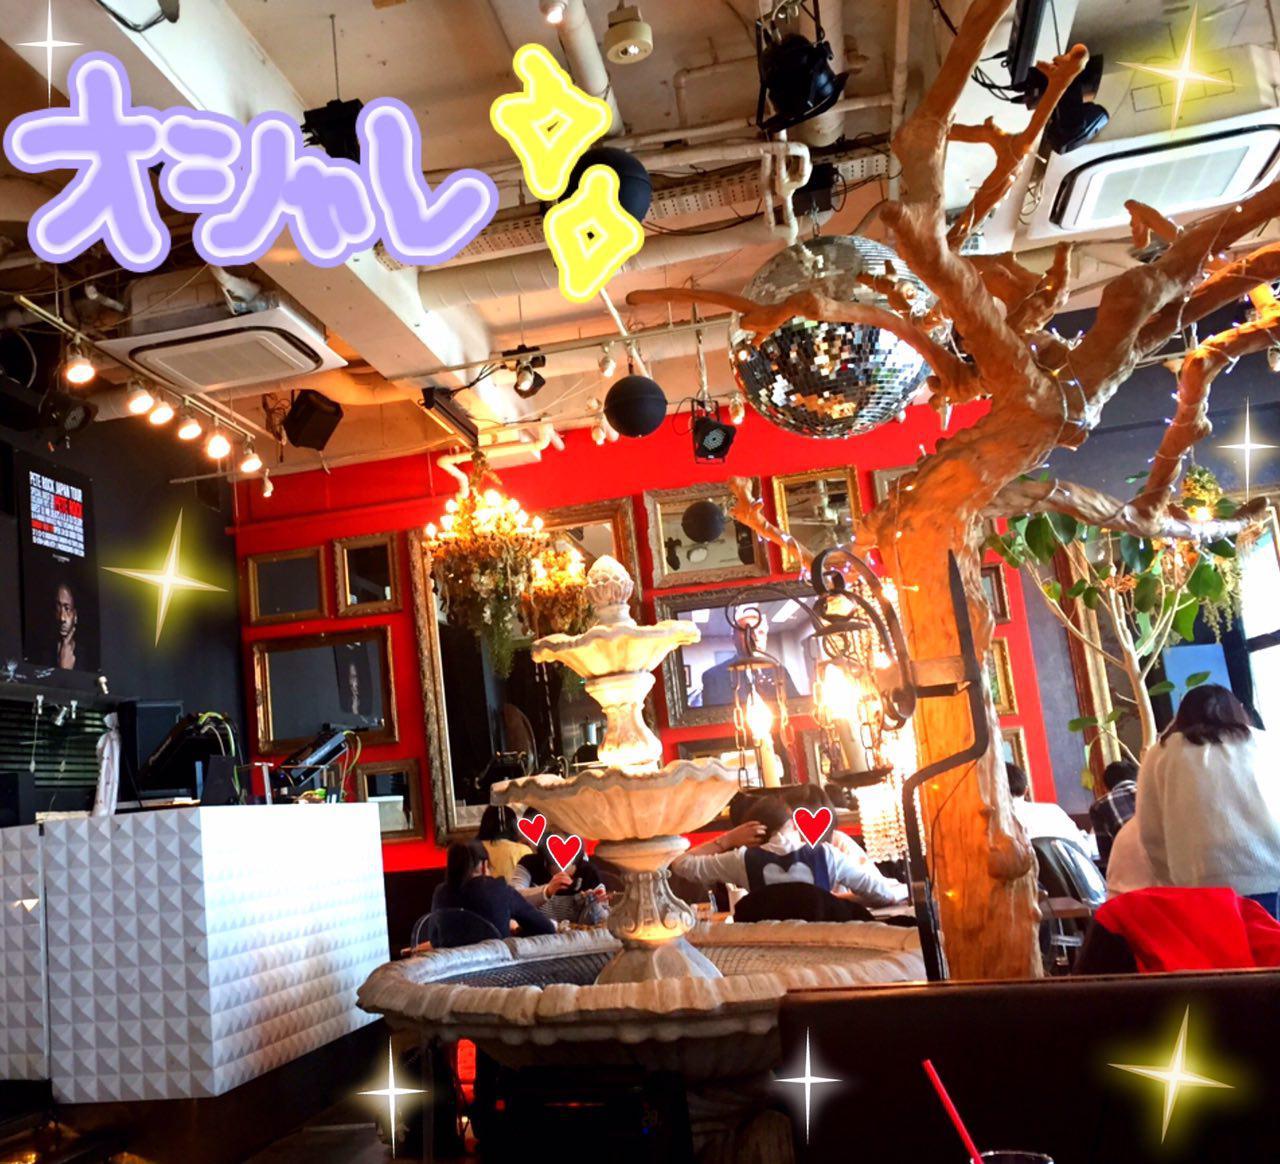 photo_2017-03-12_22-18-27.jpg